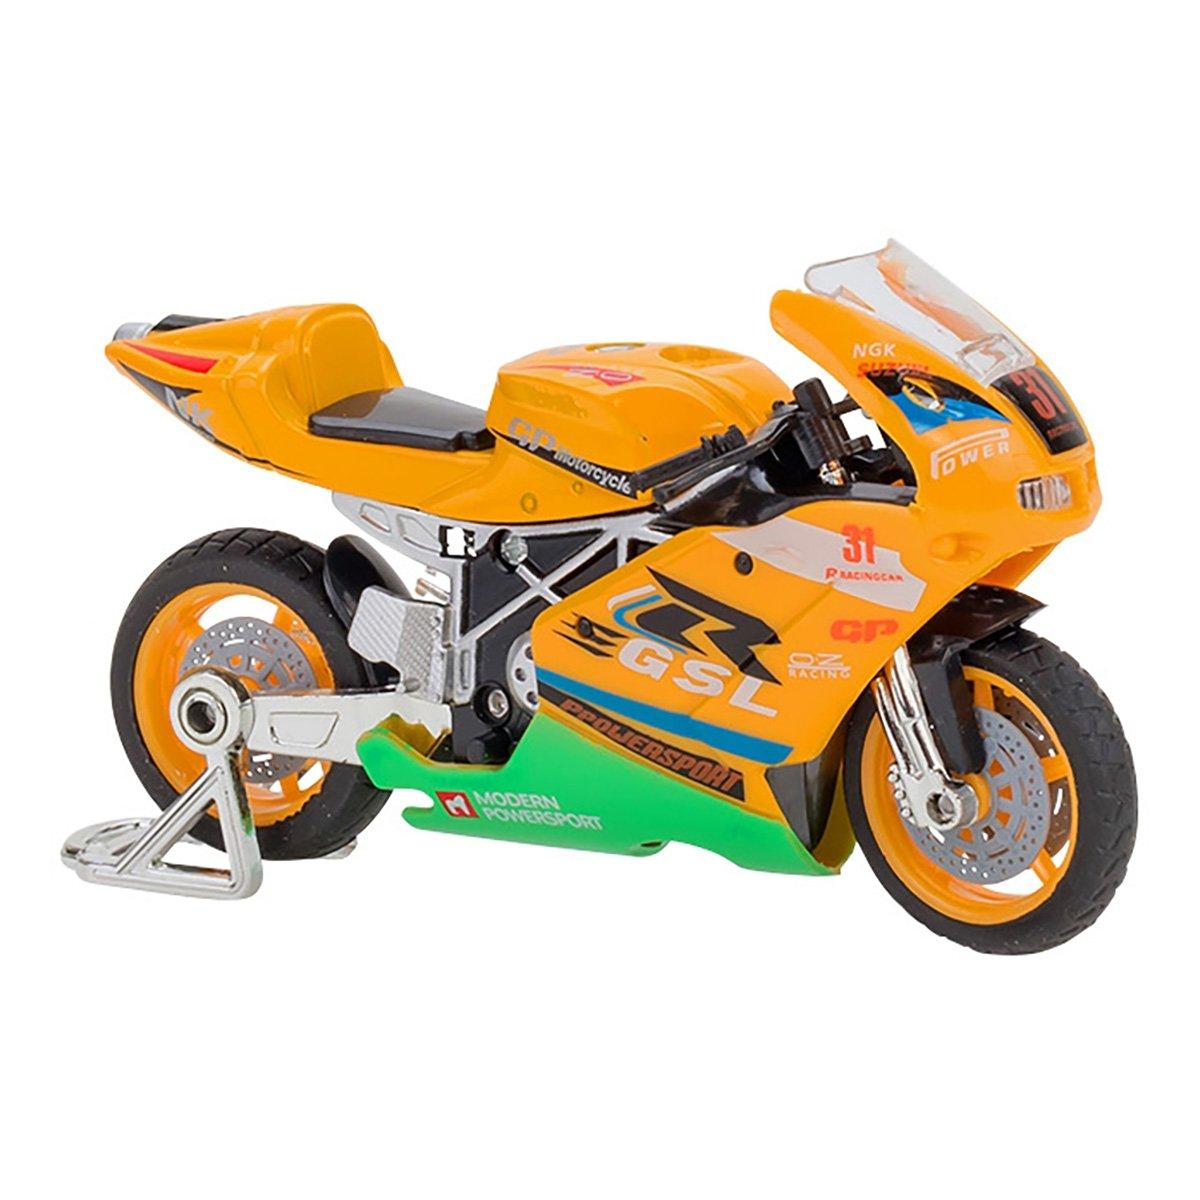 Motocicleta Globo Spidko, 1:18, Portocaliu